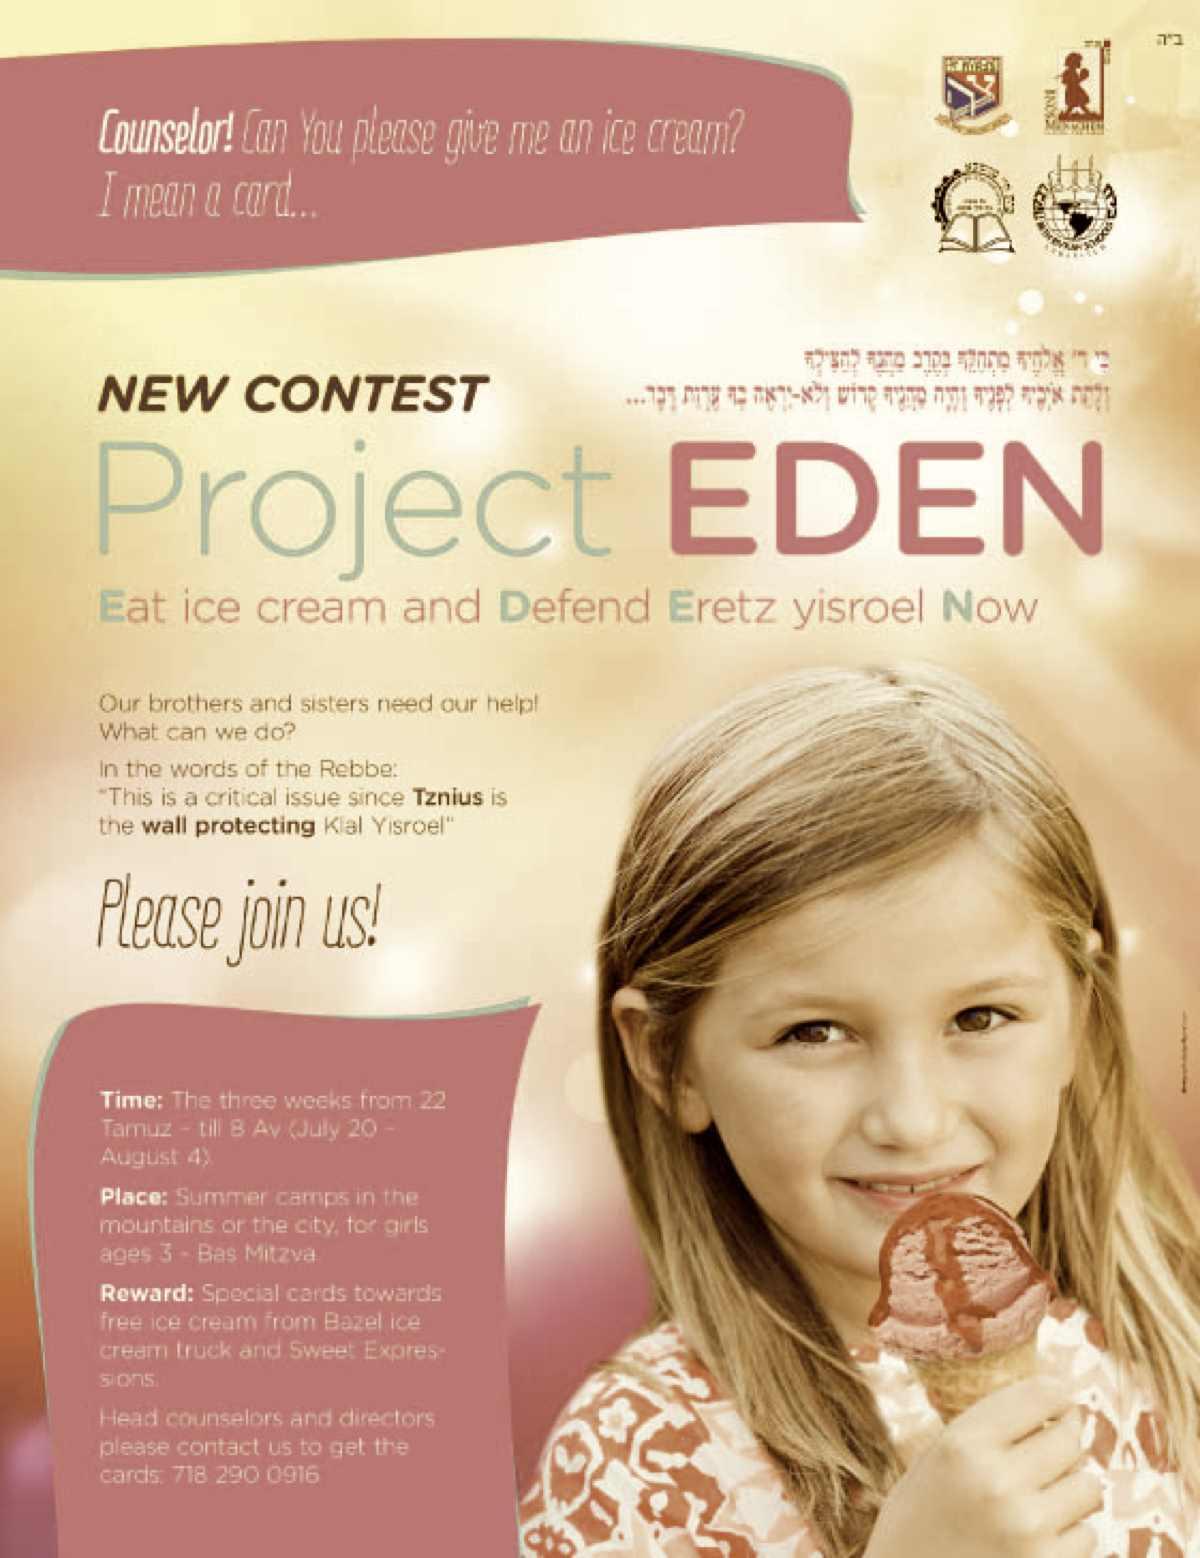 little girls tits Project Eden Tznius Chabad camp Israel war 7-17-2014